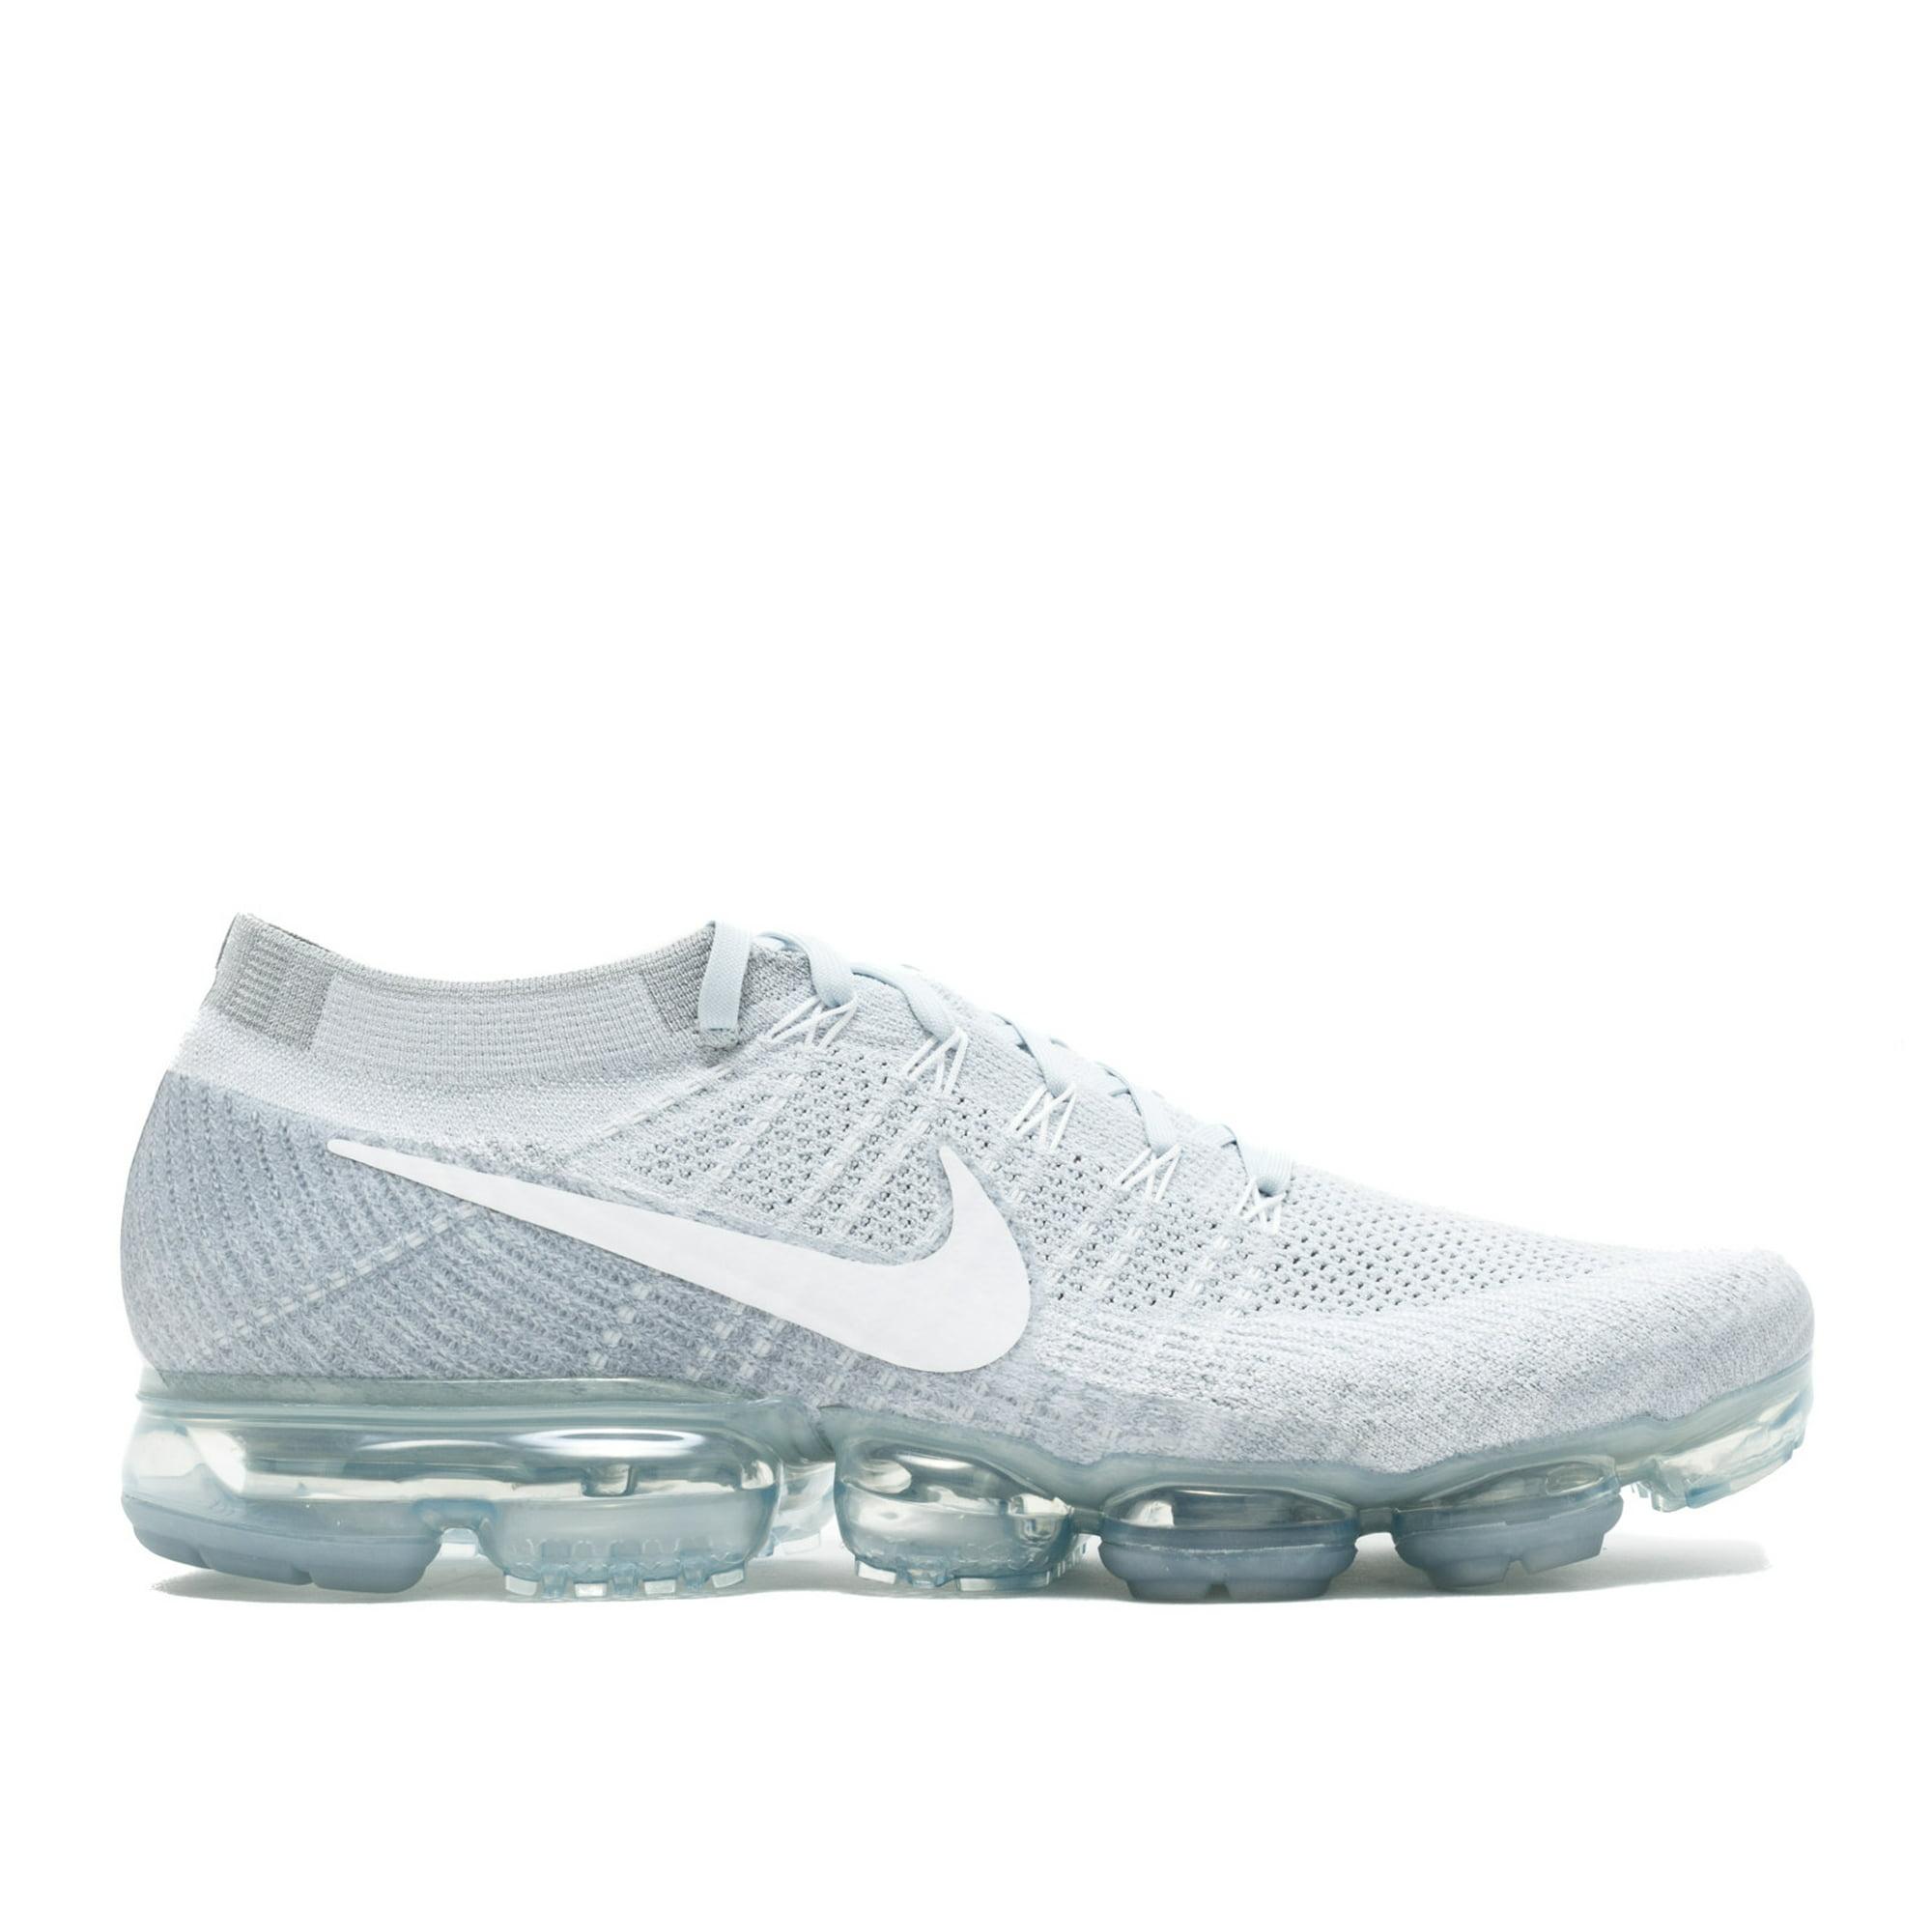 4a725d6058 Nike - Men - Nike Air Vapormax Flyknit 'Pure Platinum' - 849558-004 - Size  10   Walmart Canada ?